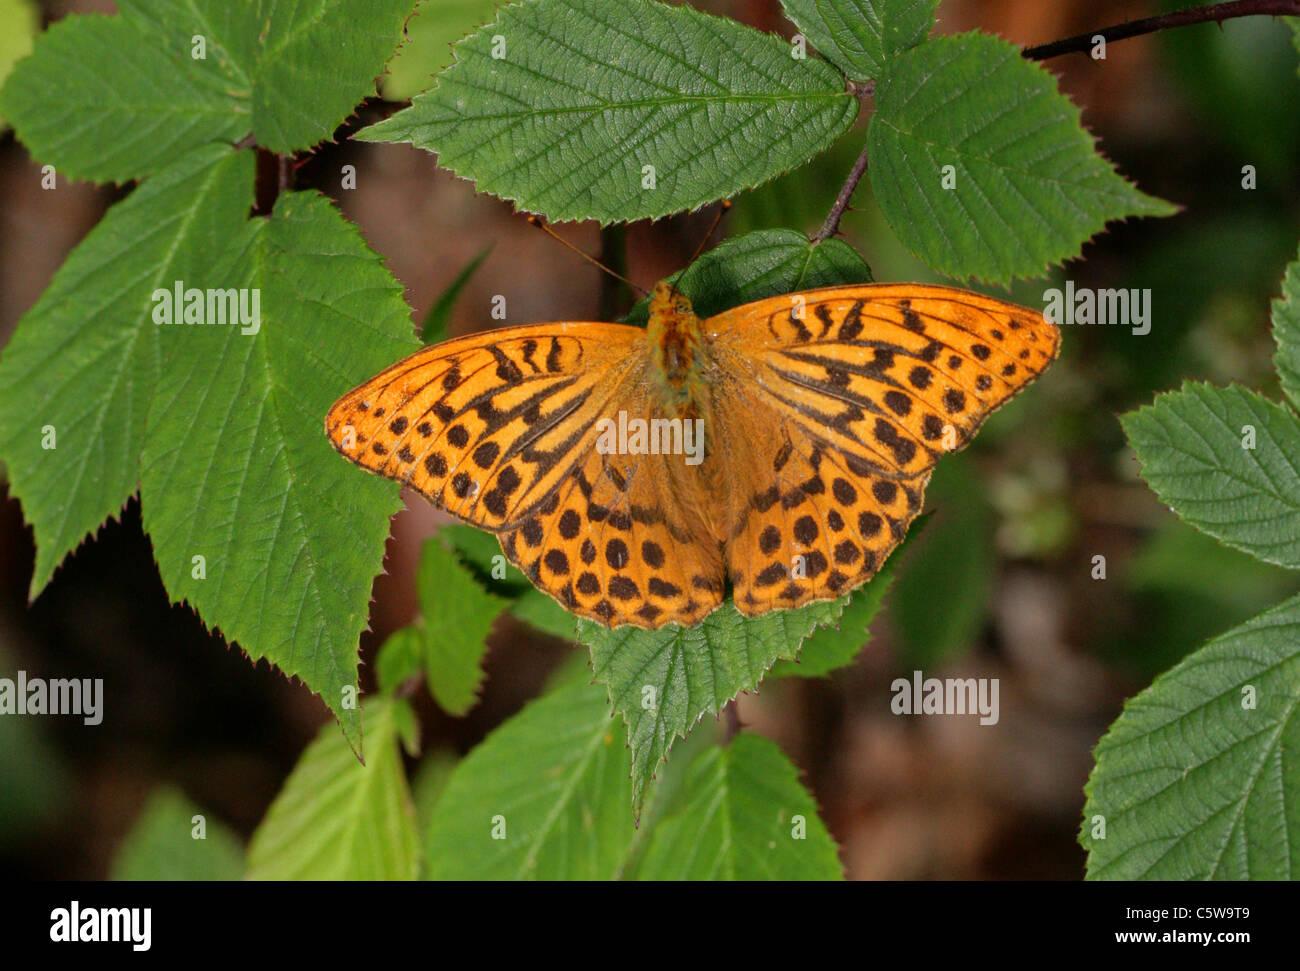 Silver-Washed Fritillary, Argynnis paphia, Nymphalidae. Resting on Bramble Leaves. Stock Photo